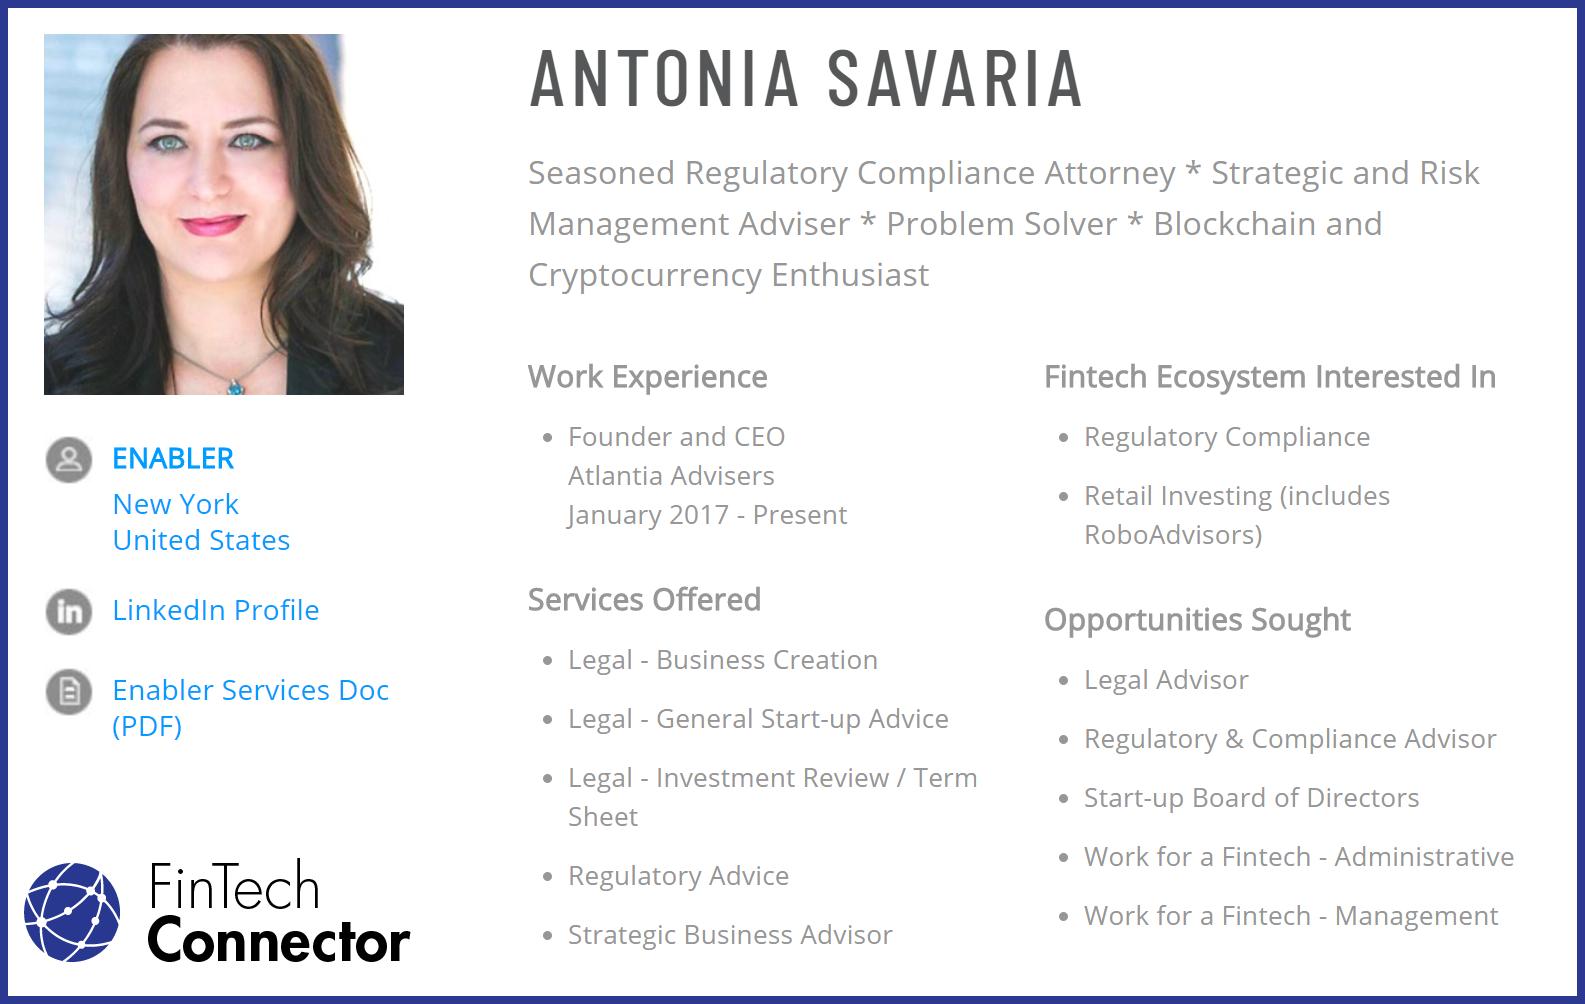 Connect with Antonia Savaria via FinTech Connector